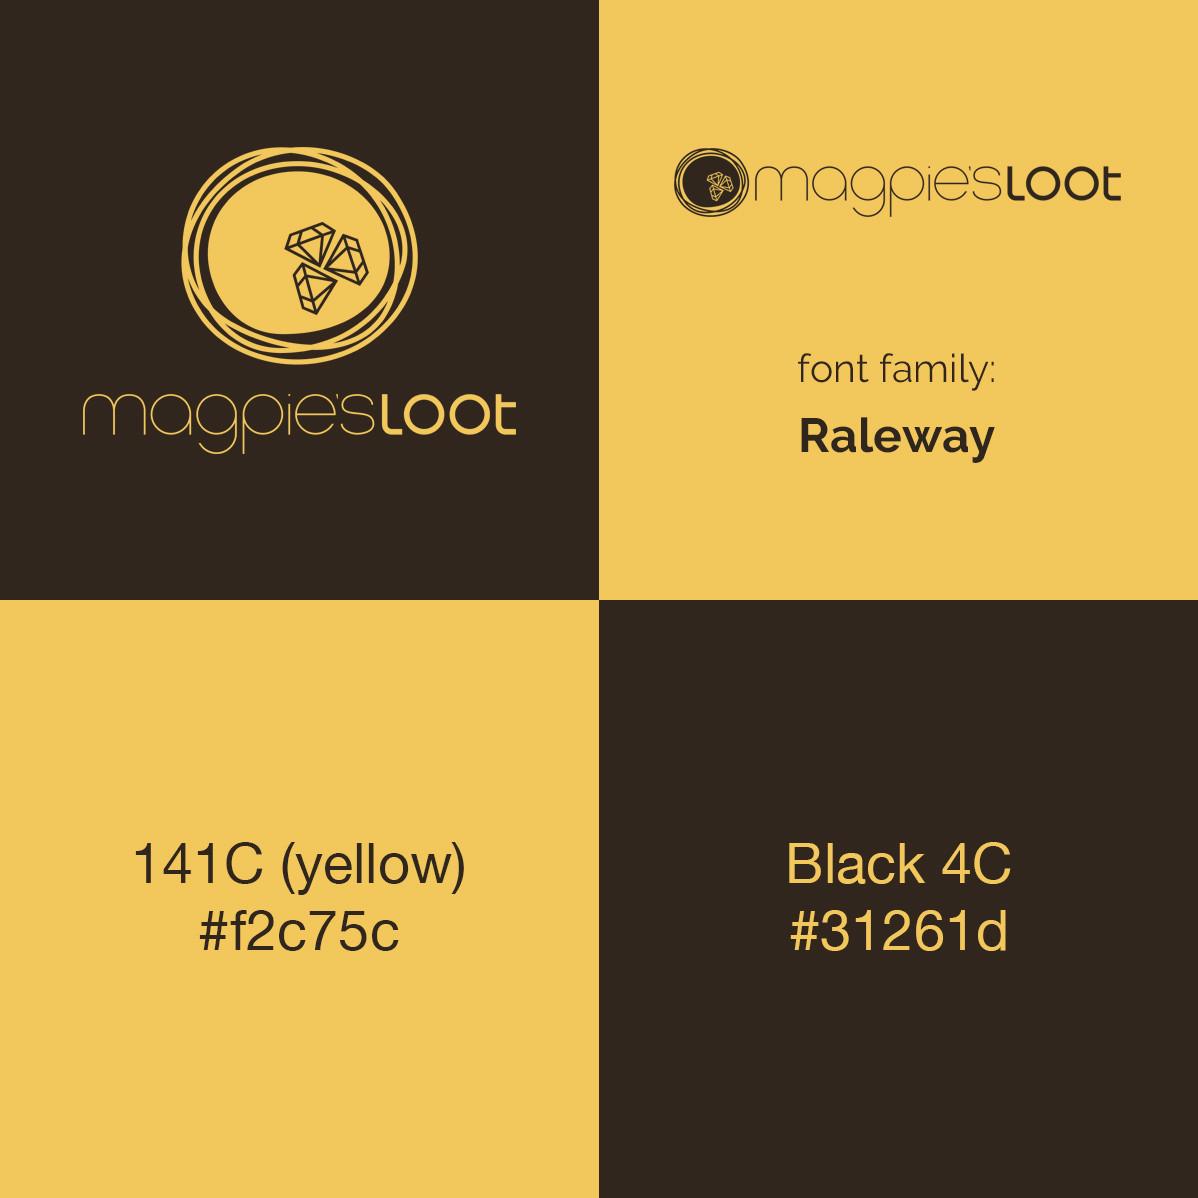 magpies-loot-logo-design-martin-marcin-r